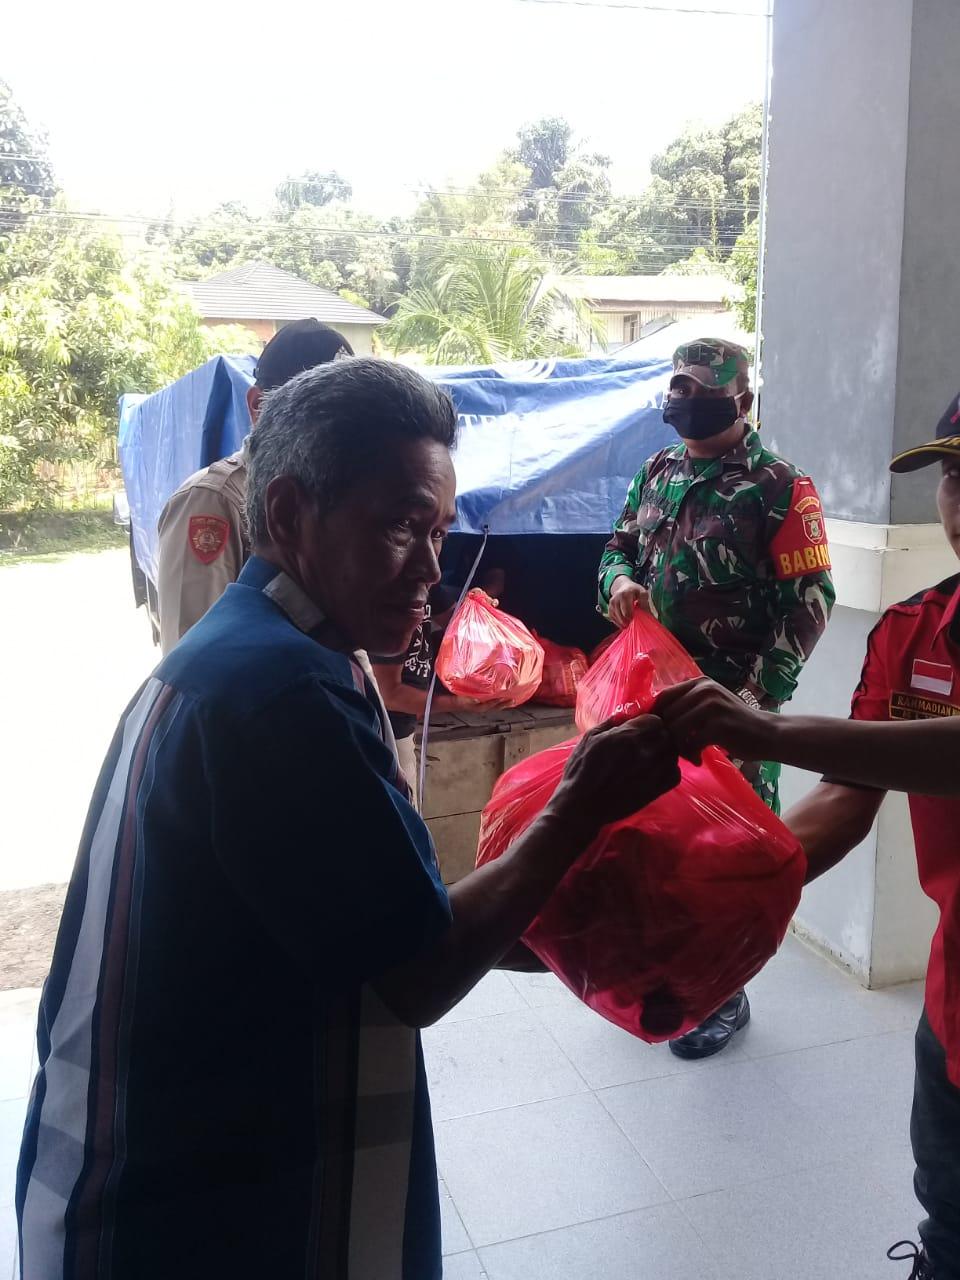 Pembagian Sembako Untuk Warga Mendapatkan Kawalan Dari Babinsa Dan Bhabinkamtibmas Kelurahan Sukarame Kec Tenggarong